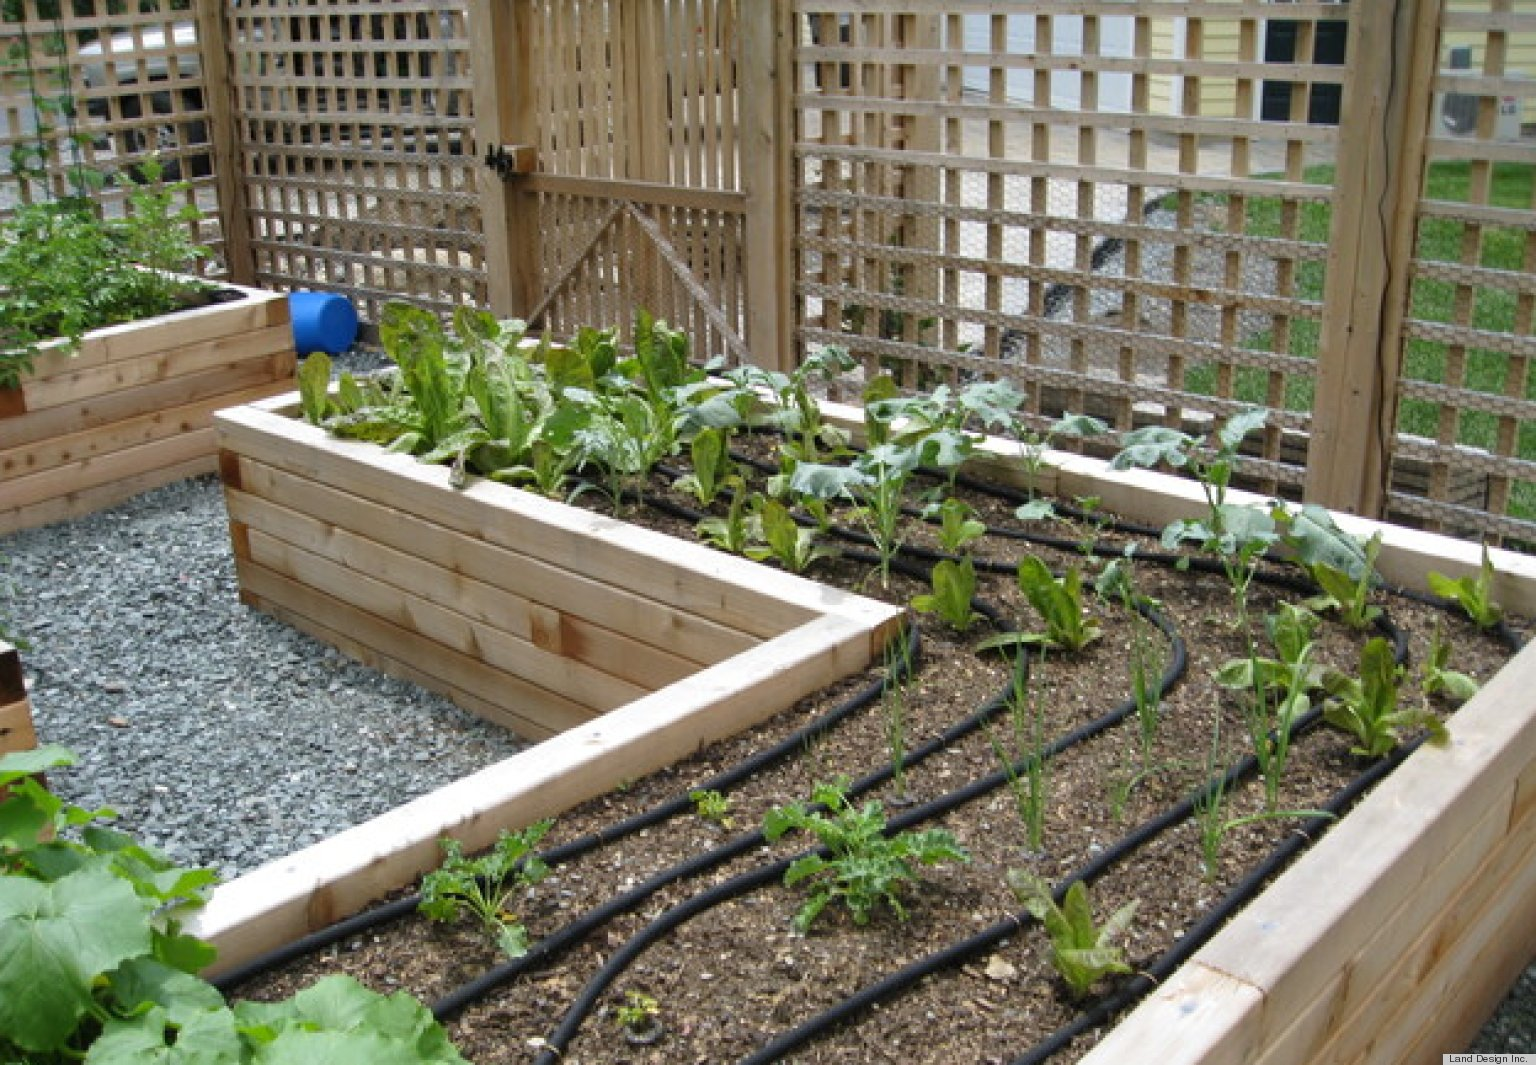 How To Build A Raised Vegie Garden  YouTube